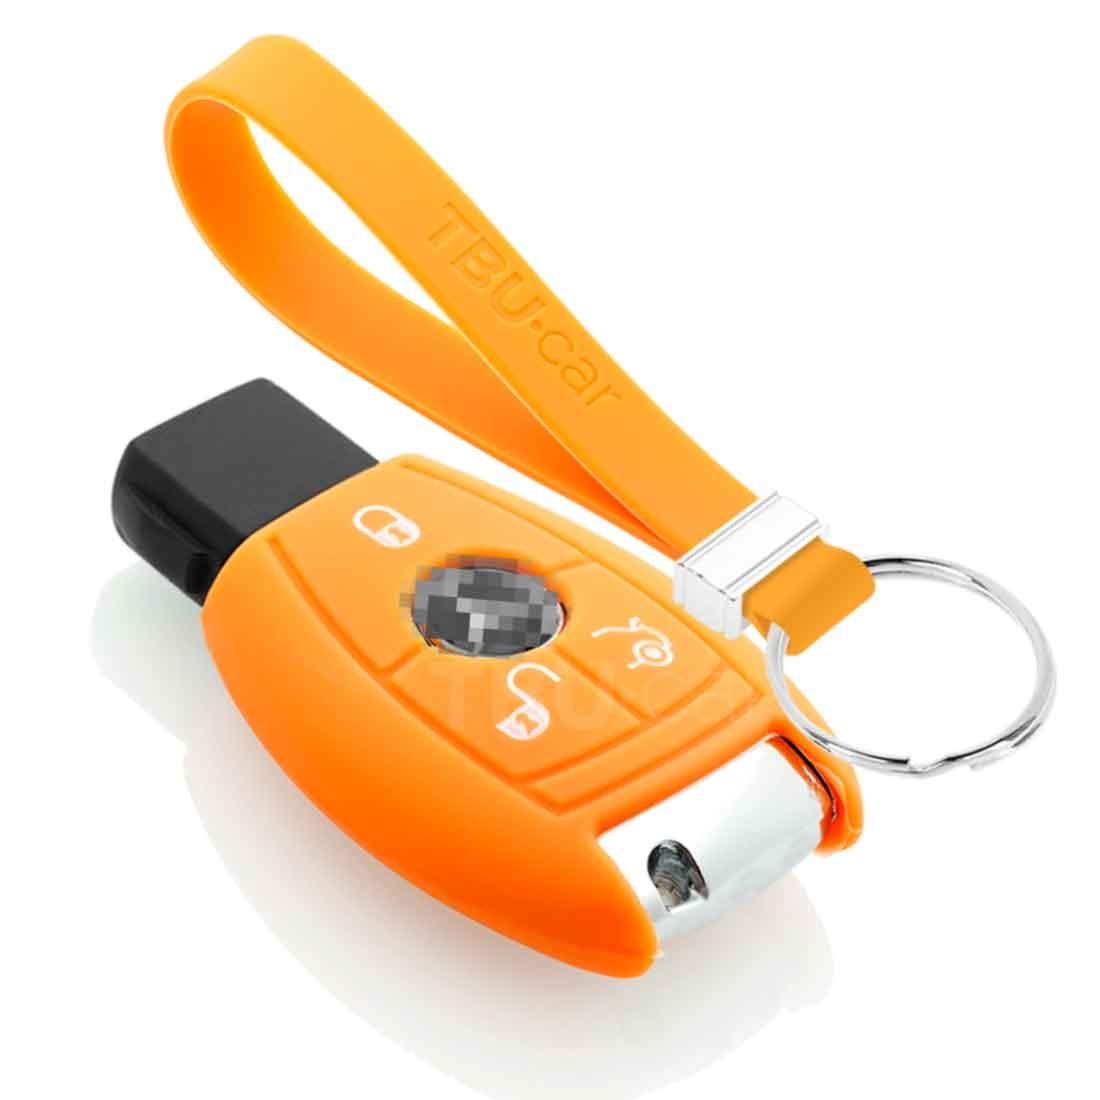 TBU car TBU car Autoschlüssel Hülle kompatibel mit Mercedes 3 Tasten - Schutzhülle aus Silikon - Auto Schlüsselhülle Cover in Orange